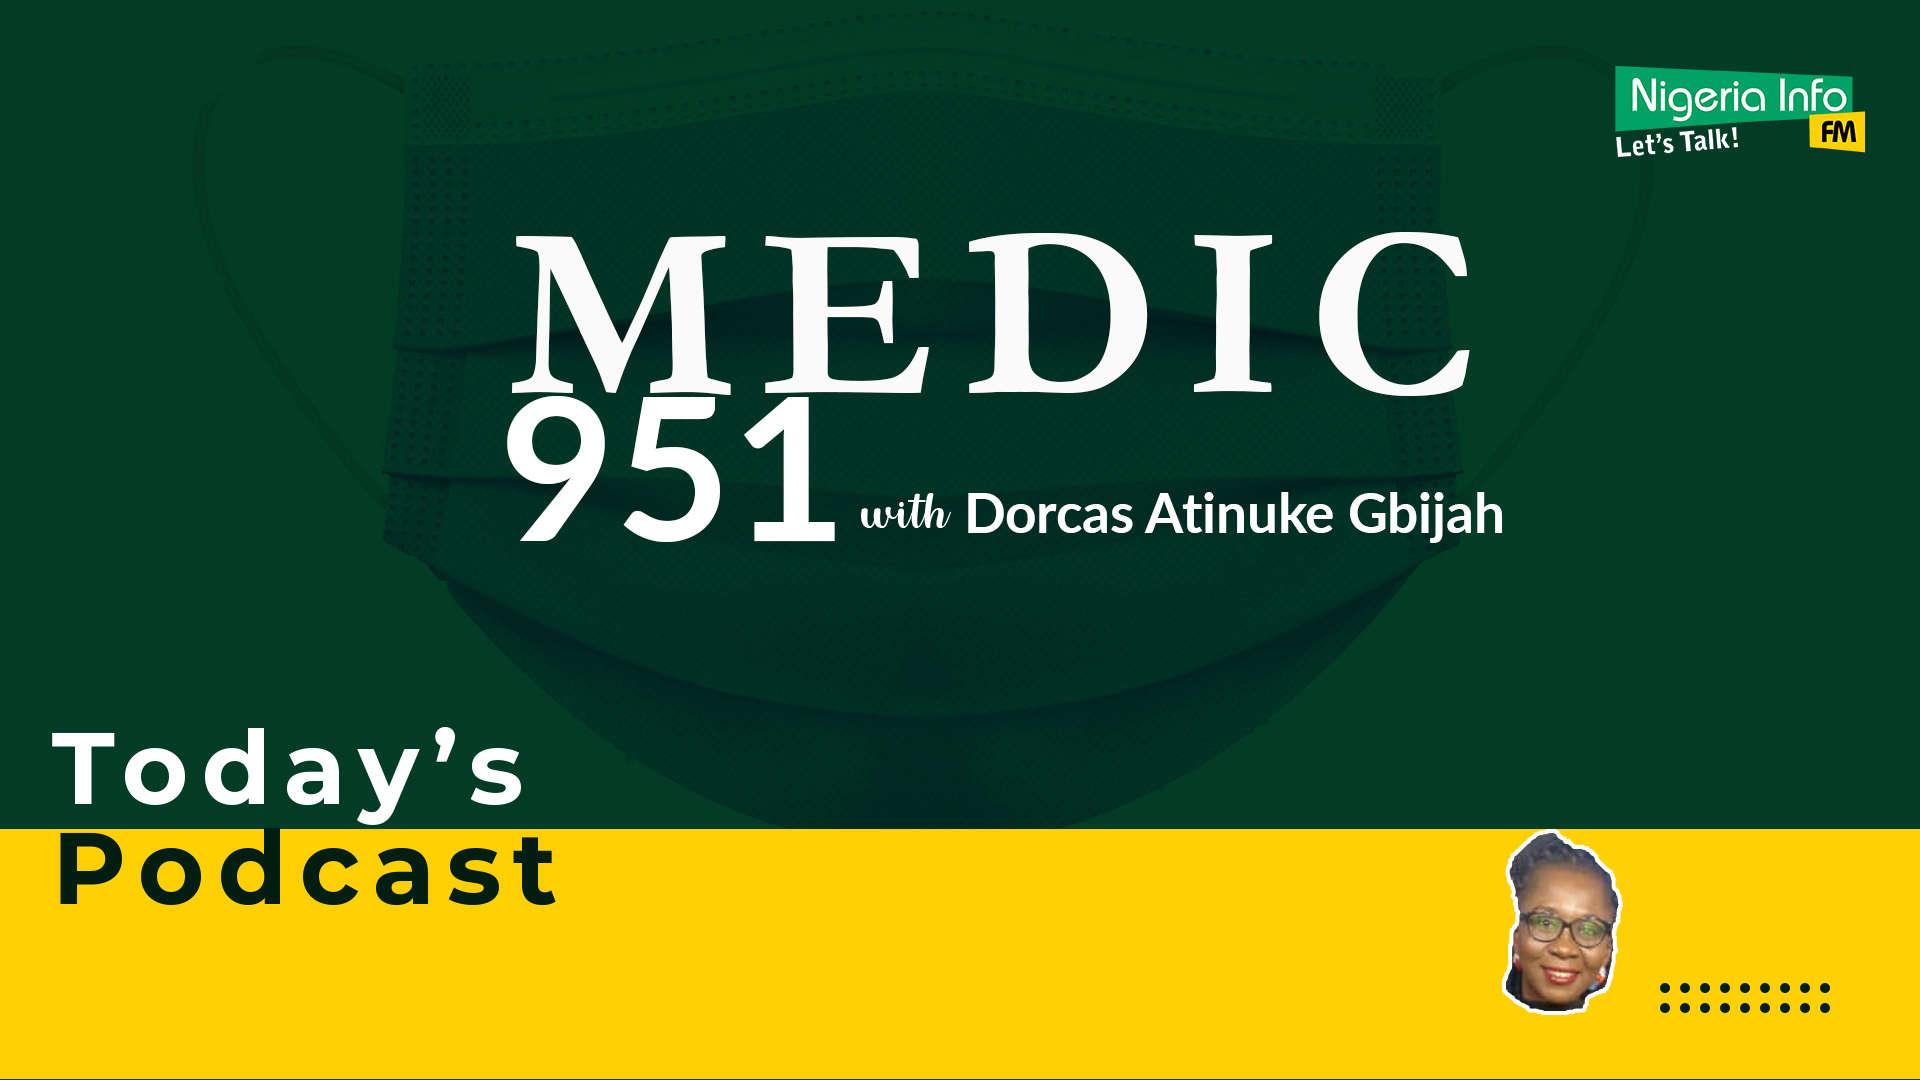 Medic 951